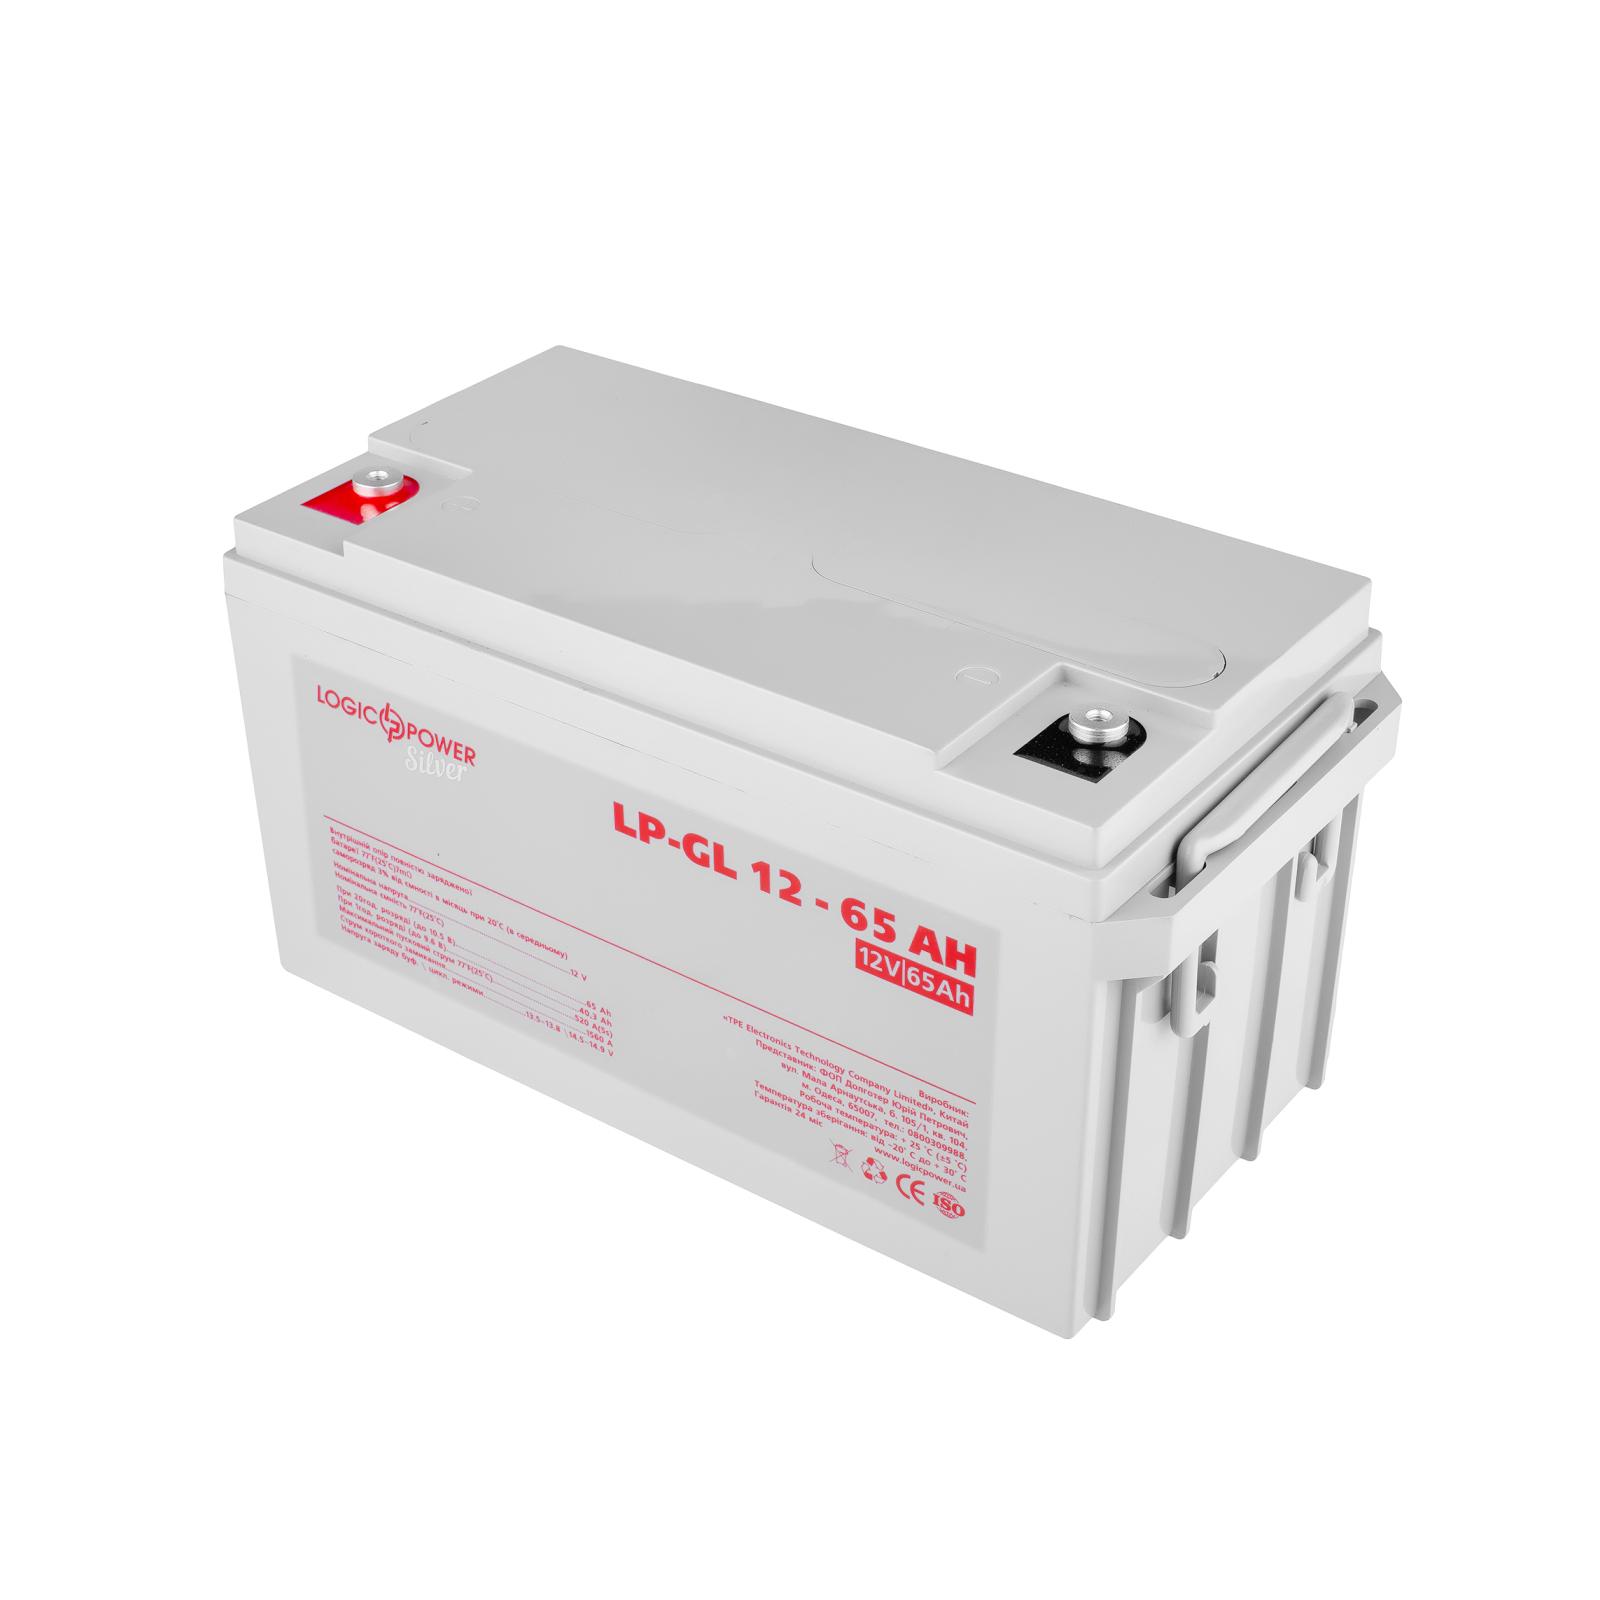 Батарея к ИБП LogicPower GL 12В 65 Ач (2322)